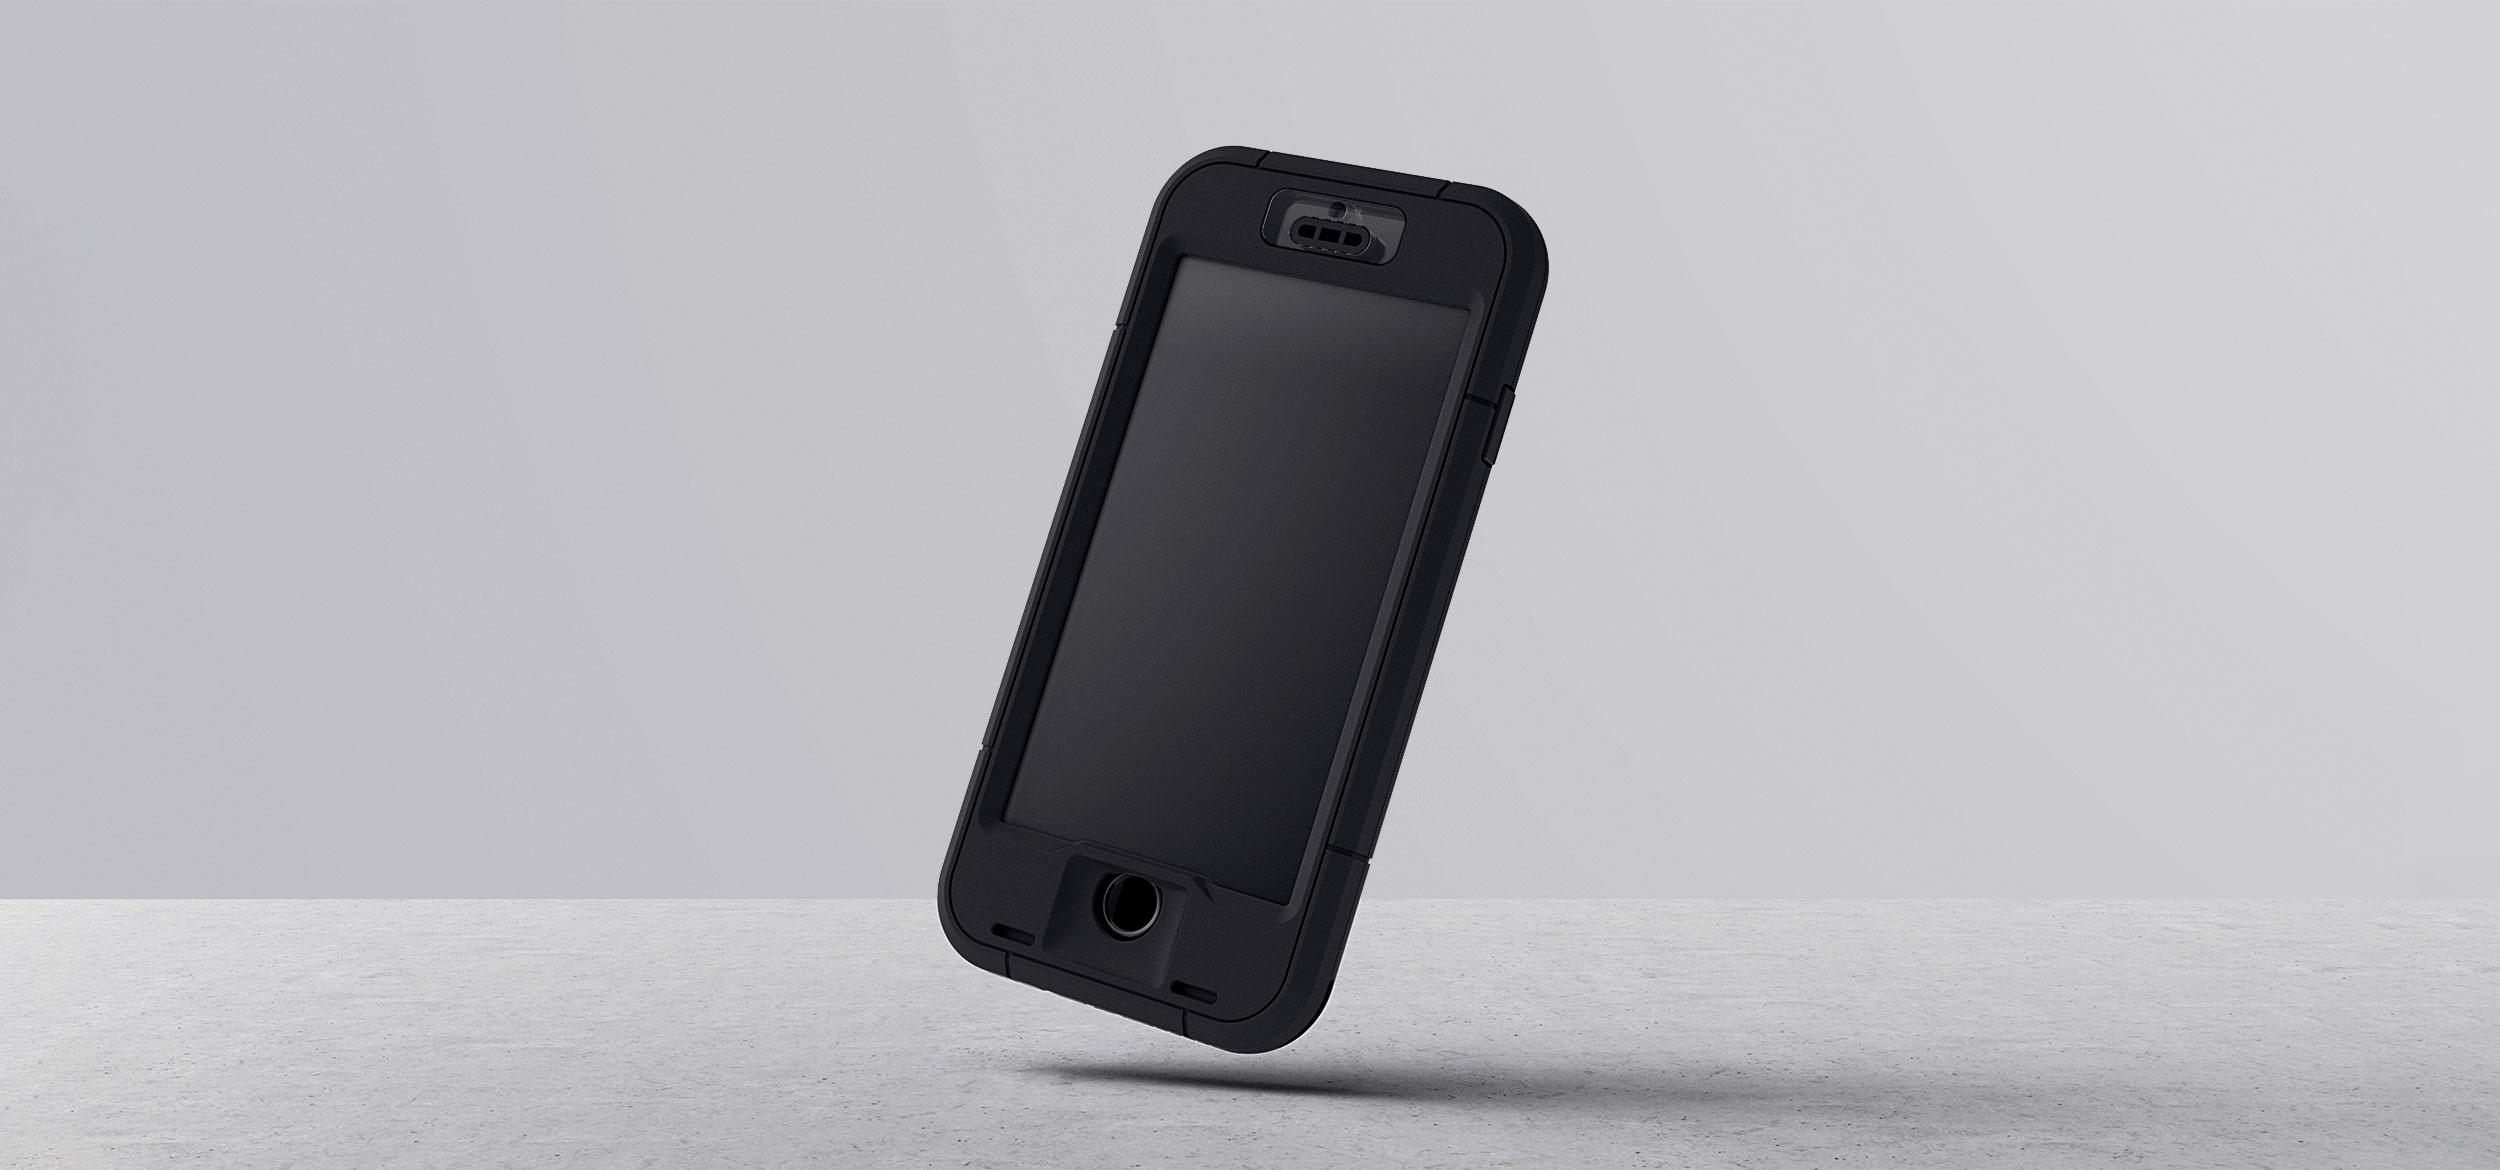 Dog & Bone Wetsuit Waterproof iPhone Case